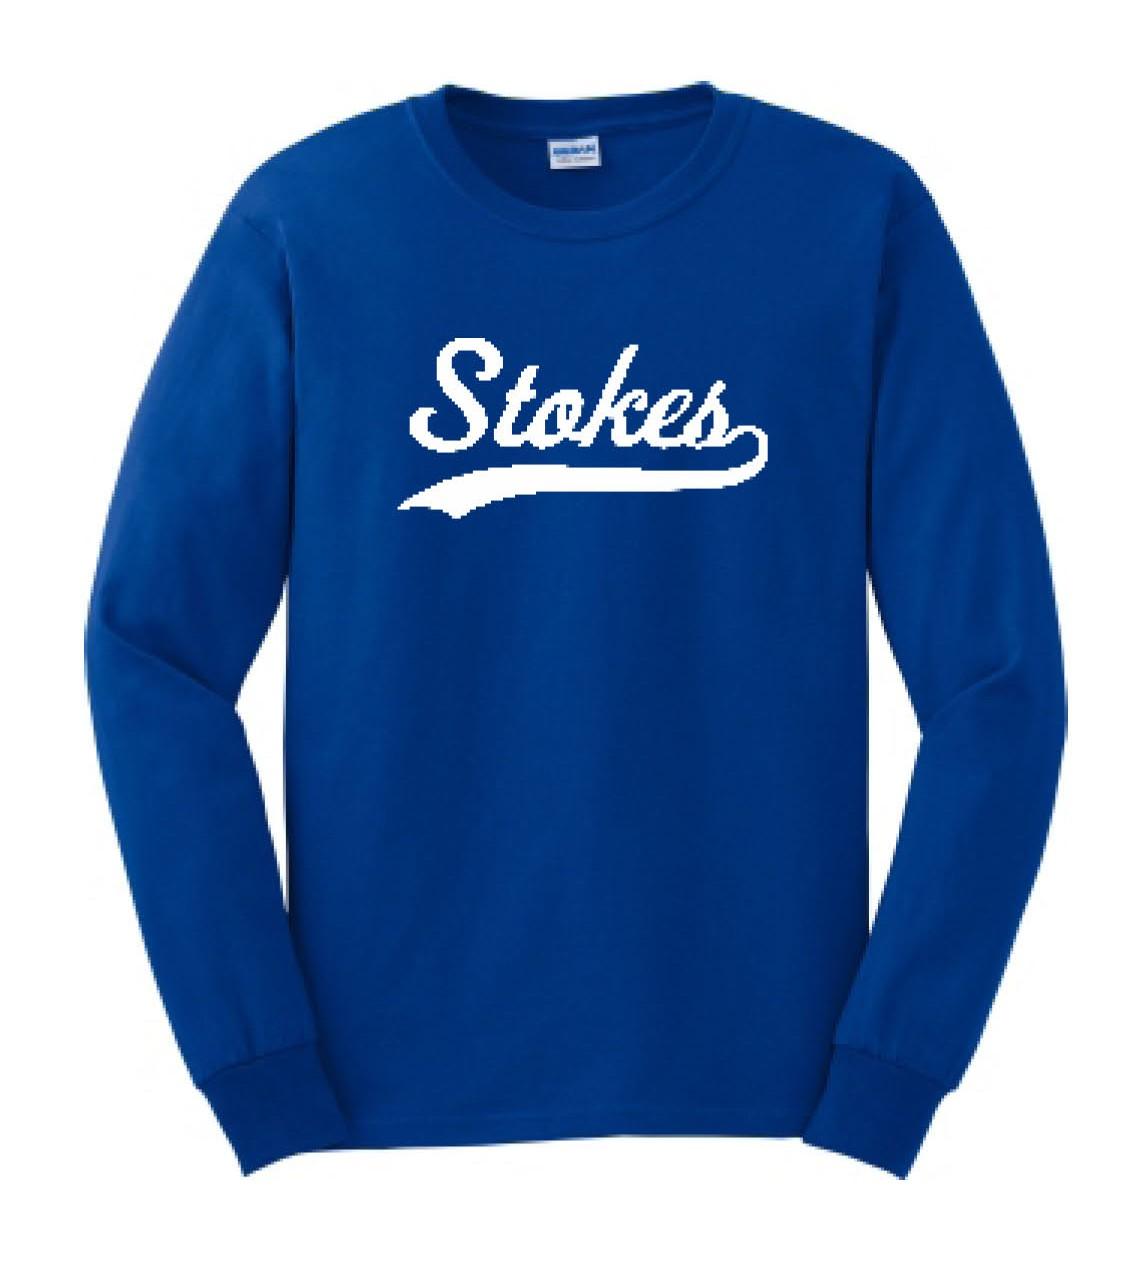 Stokes Swoosh Long Sleeve Tees